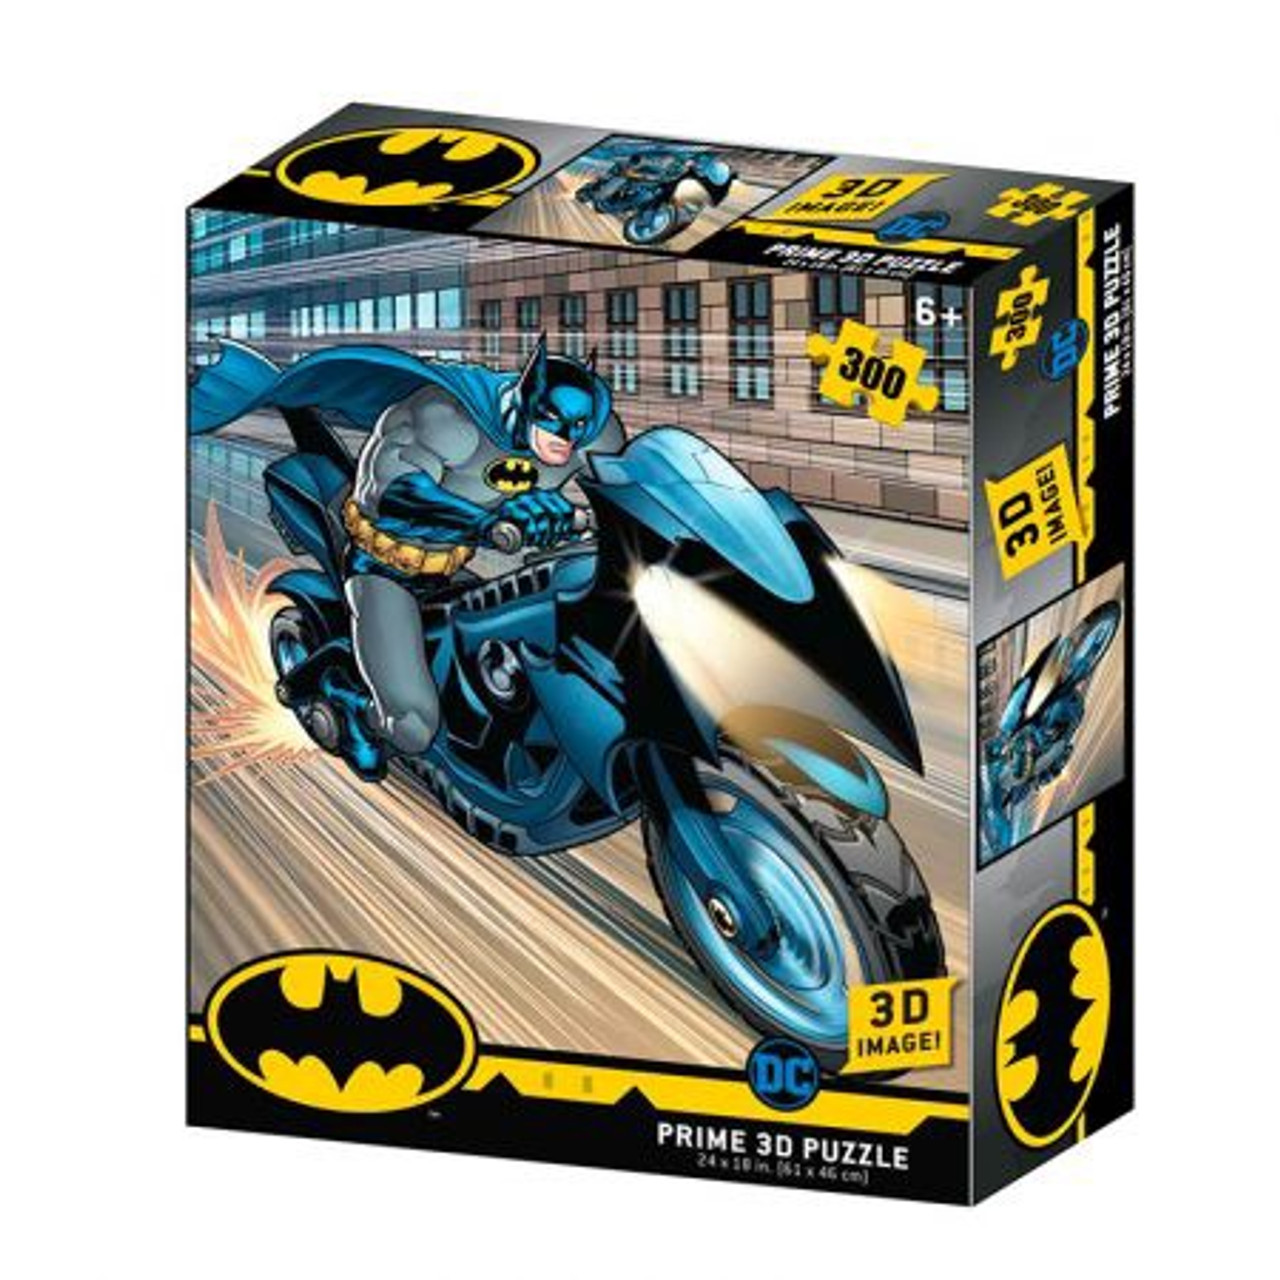 3D PUZZLE BATMAN BATMOBILE 300 PCS